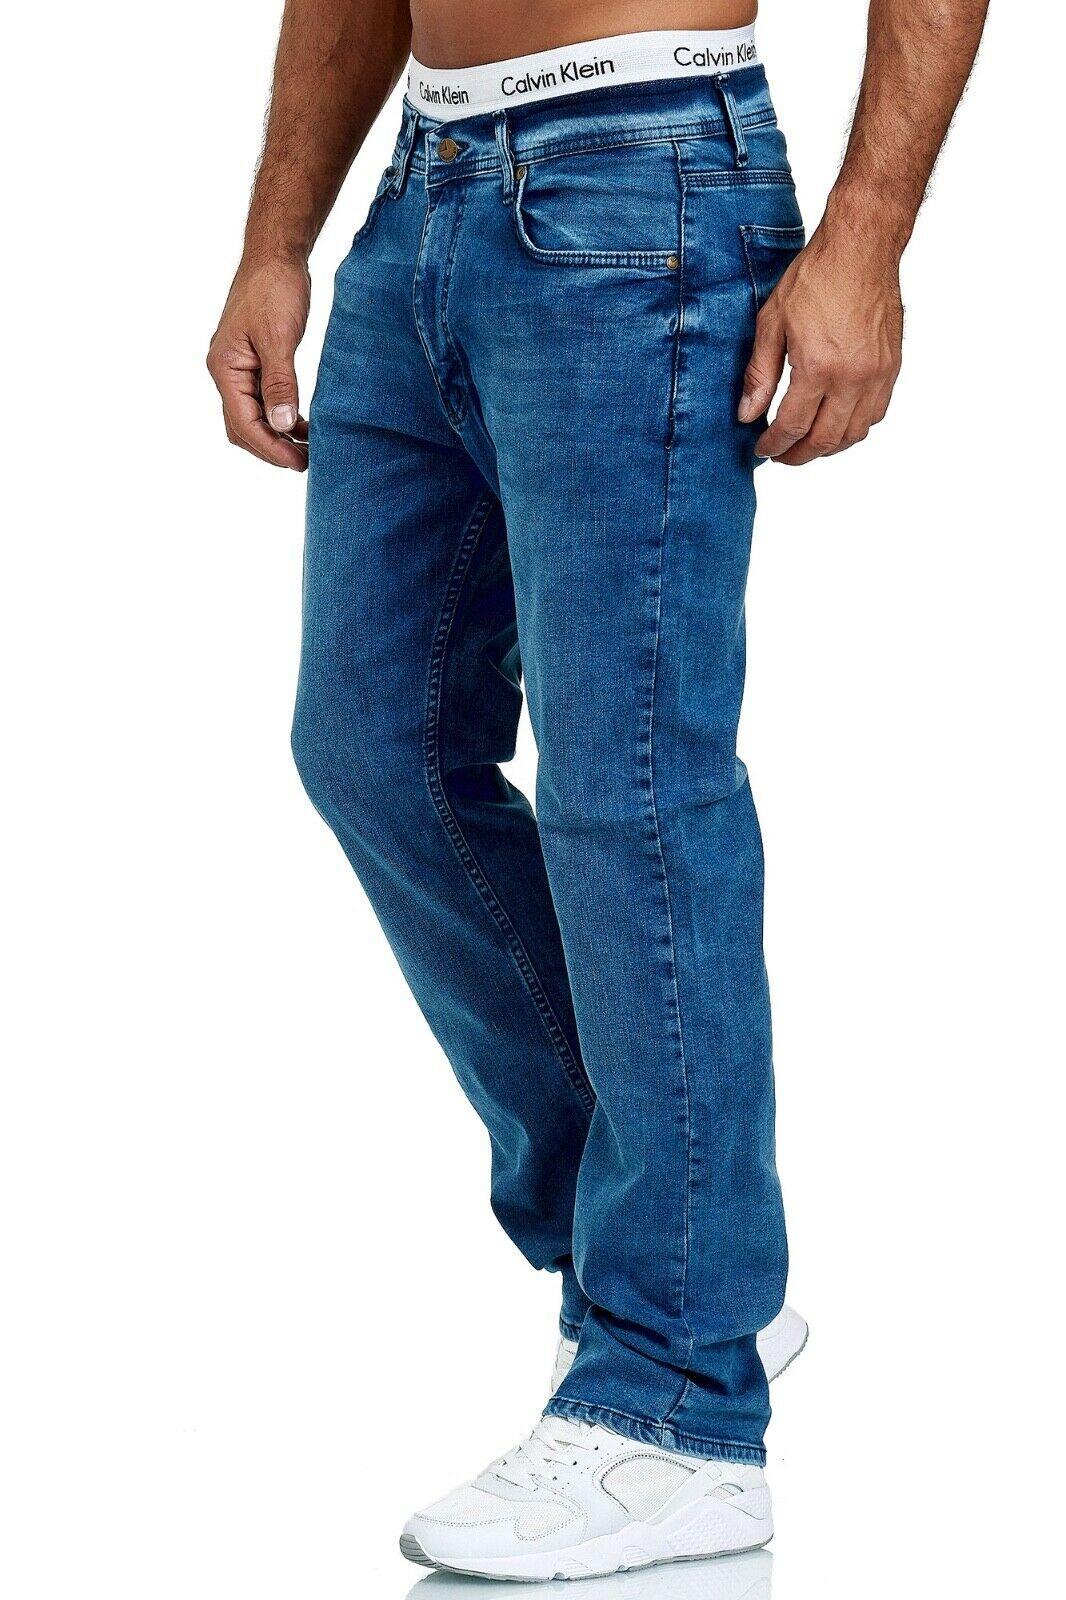 Herren-Jeans-Hose-Denim-KC-Black-Washed-Straight-Cut-Regular-Dicke-Naht-naehte Indexbild 62